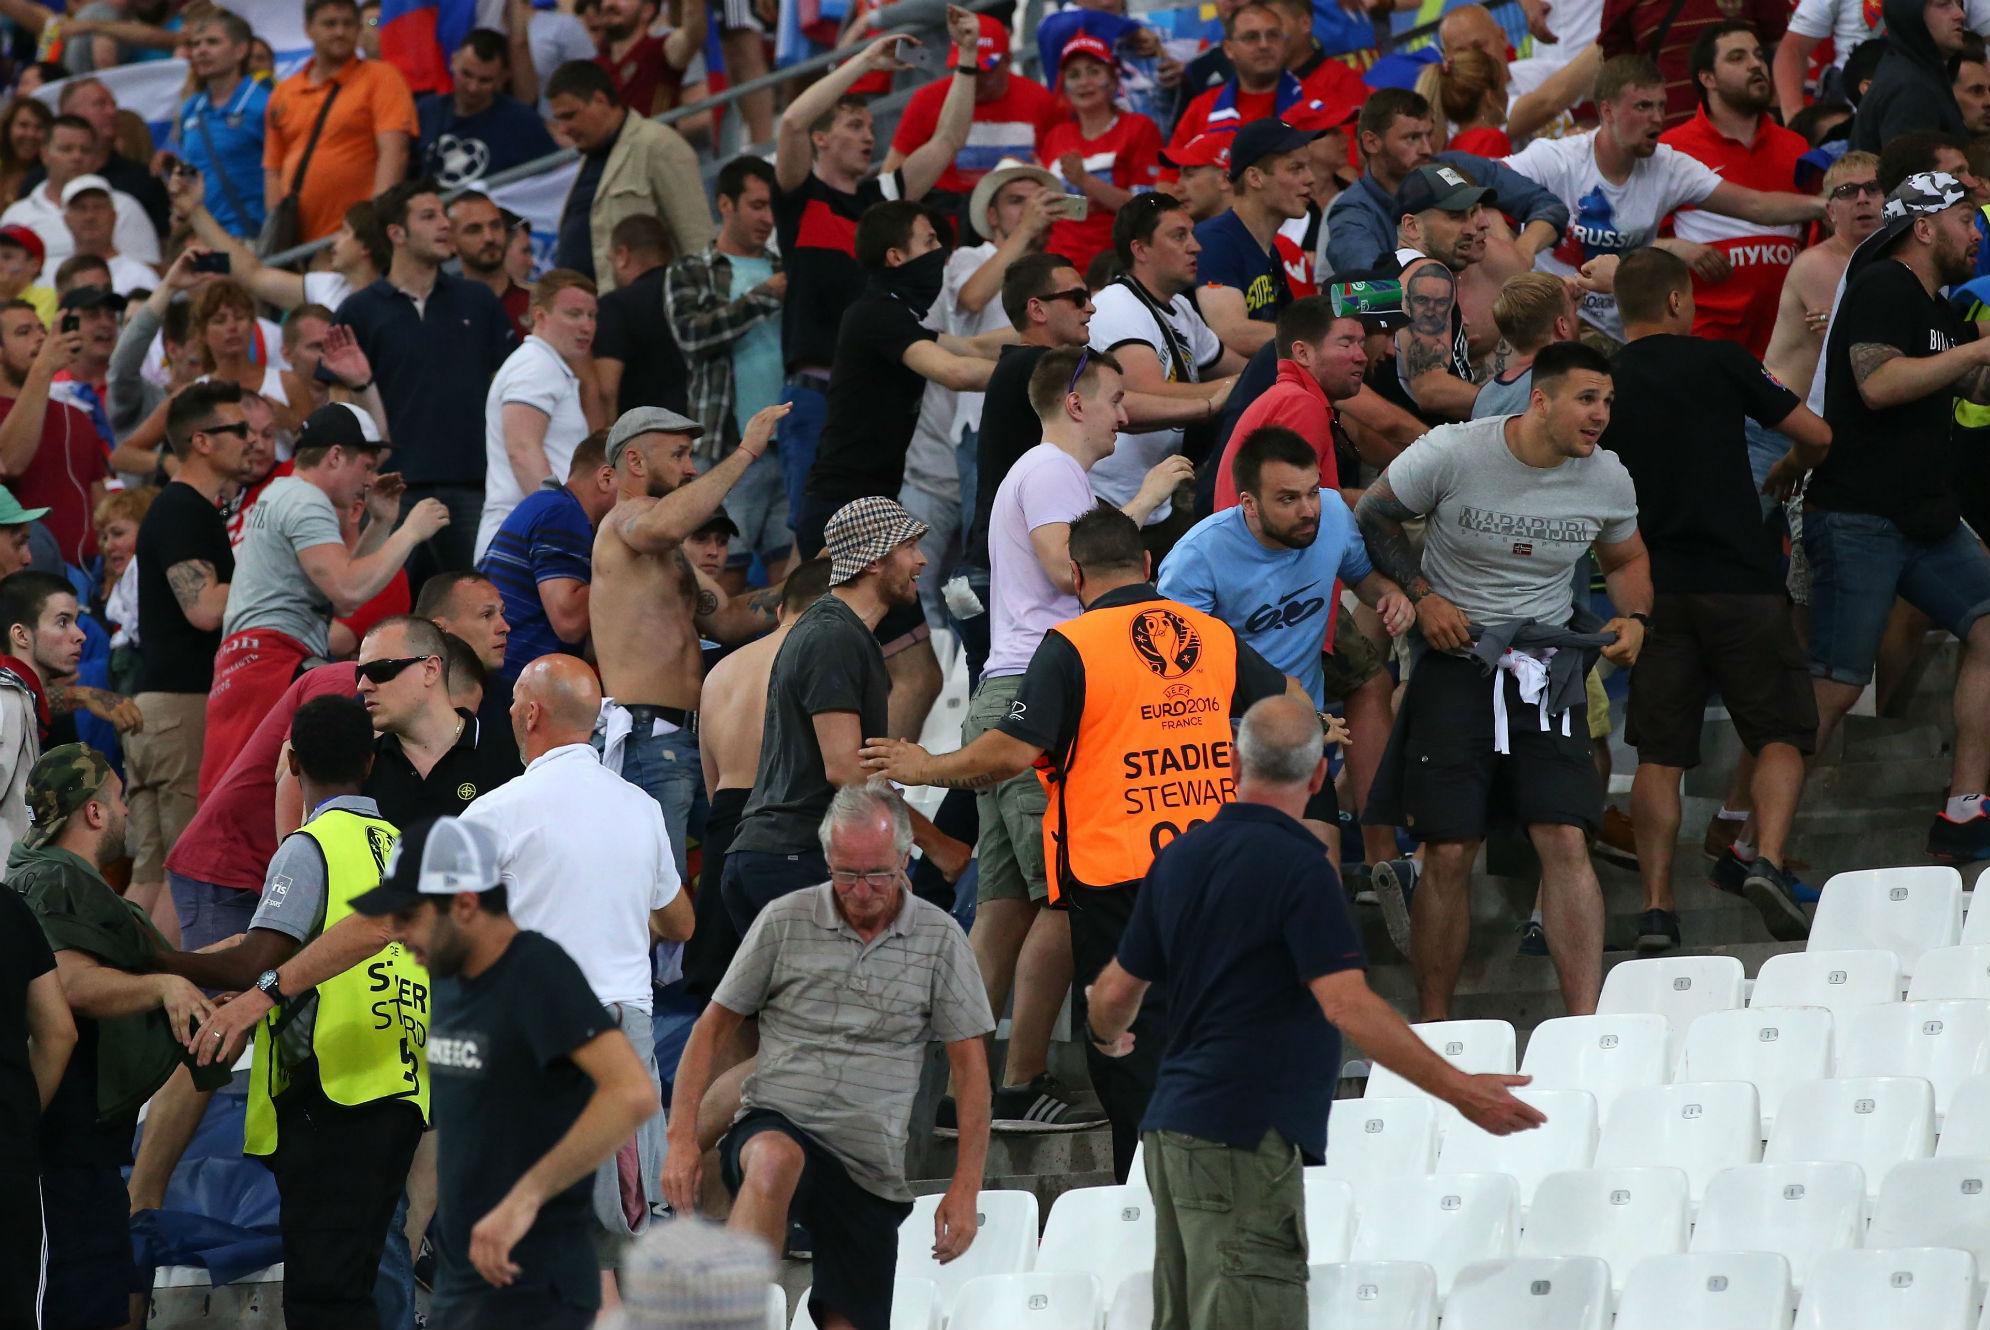 Russia hooligans Euro 2016